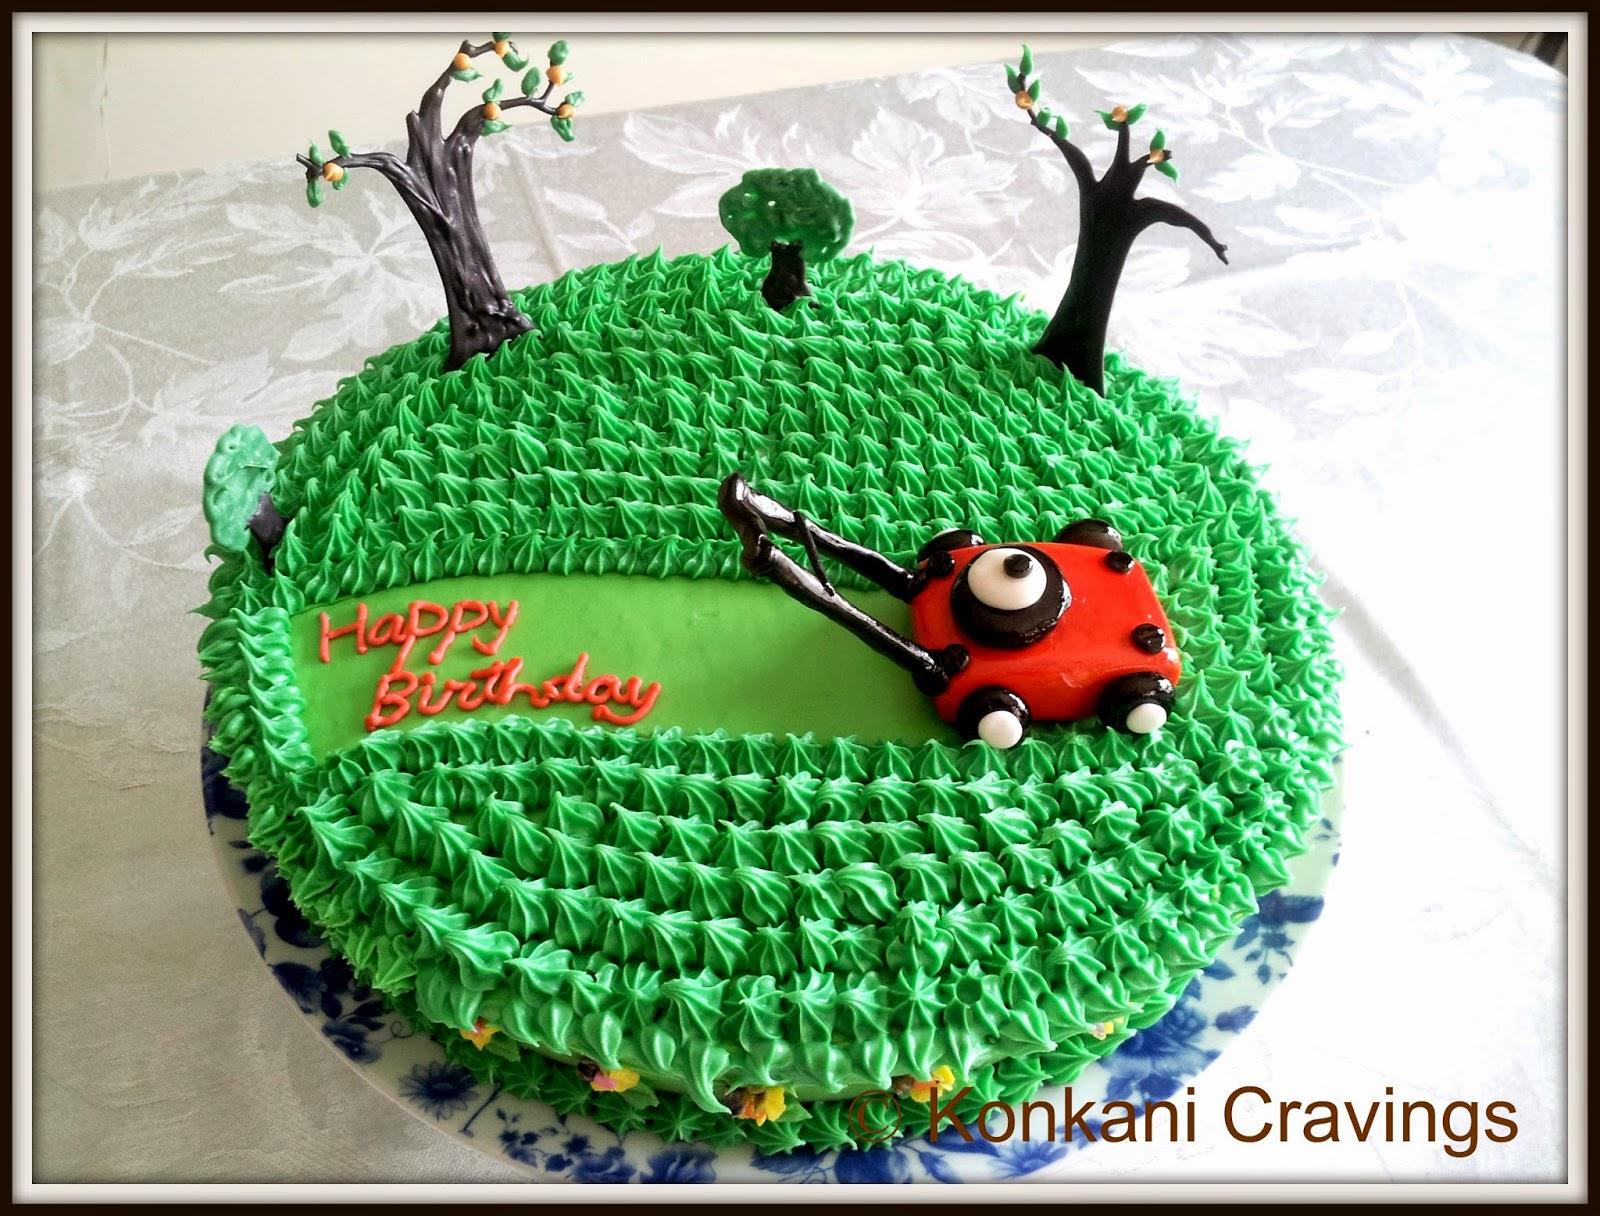 Konkani Cravings Birthday Cake Lawn Mower